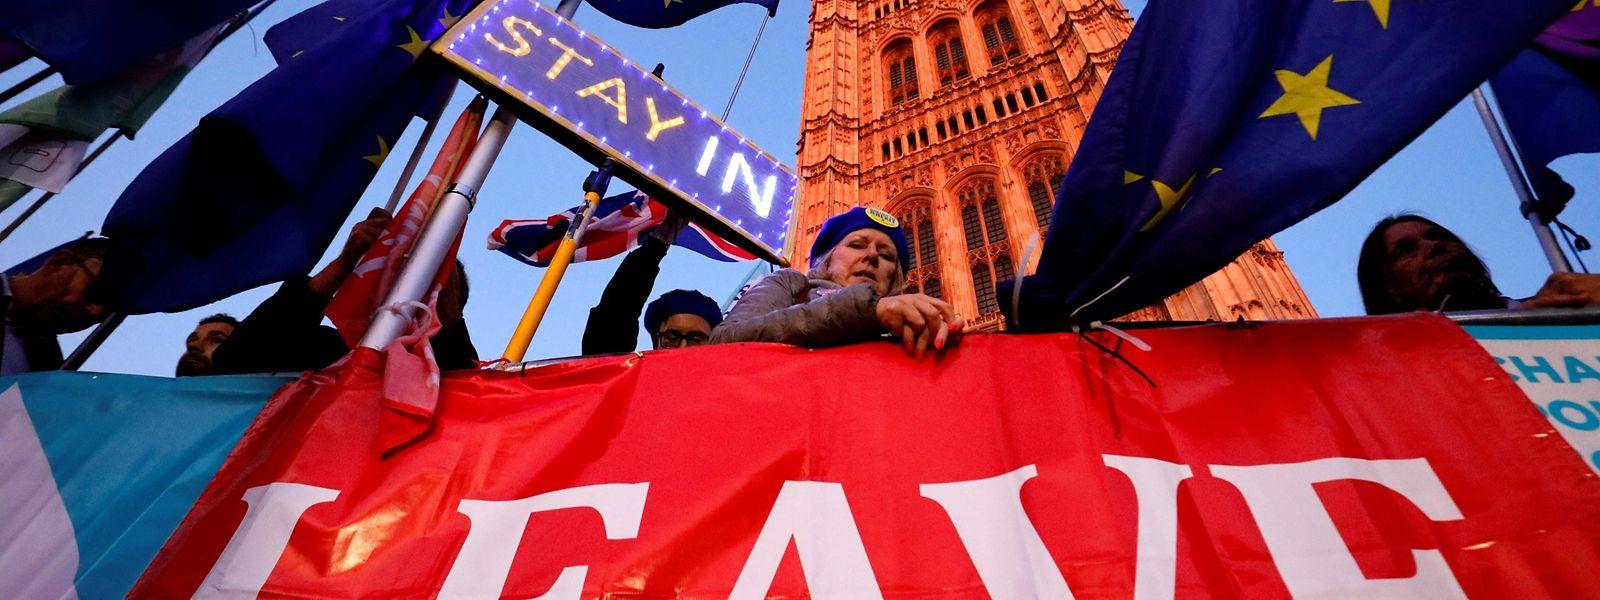 Demonstranten beider Lager vor dem Parlament in Westminster.